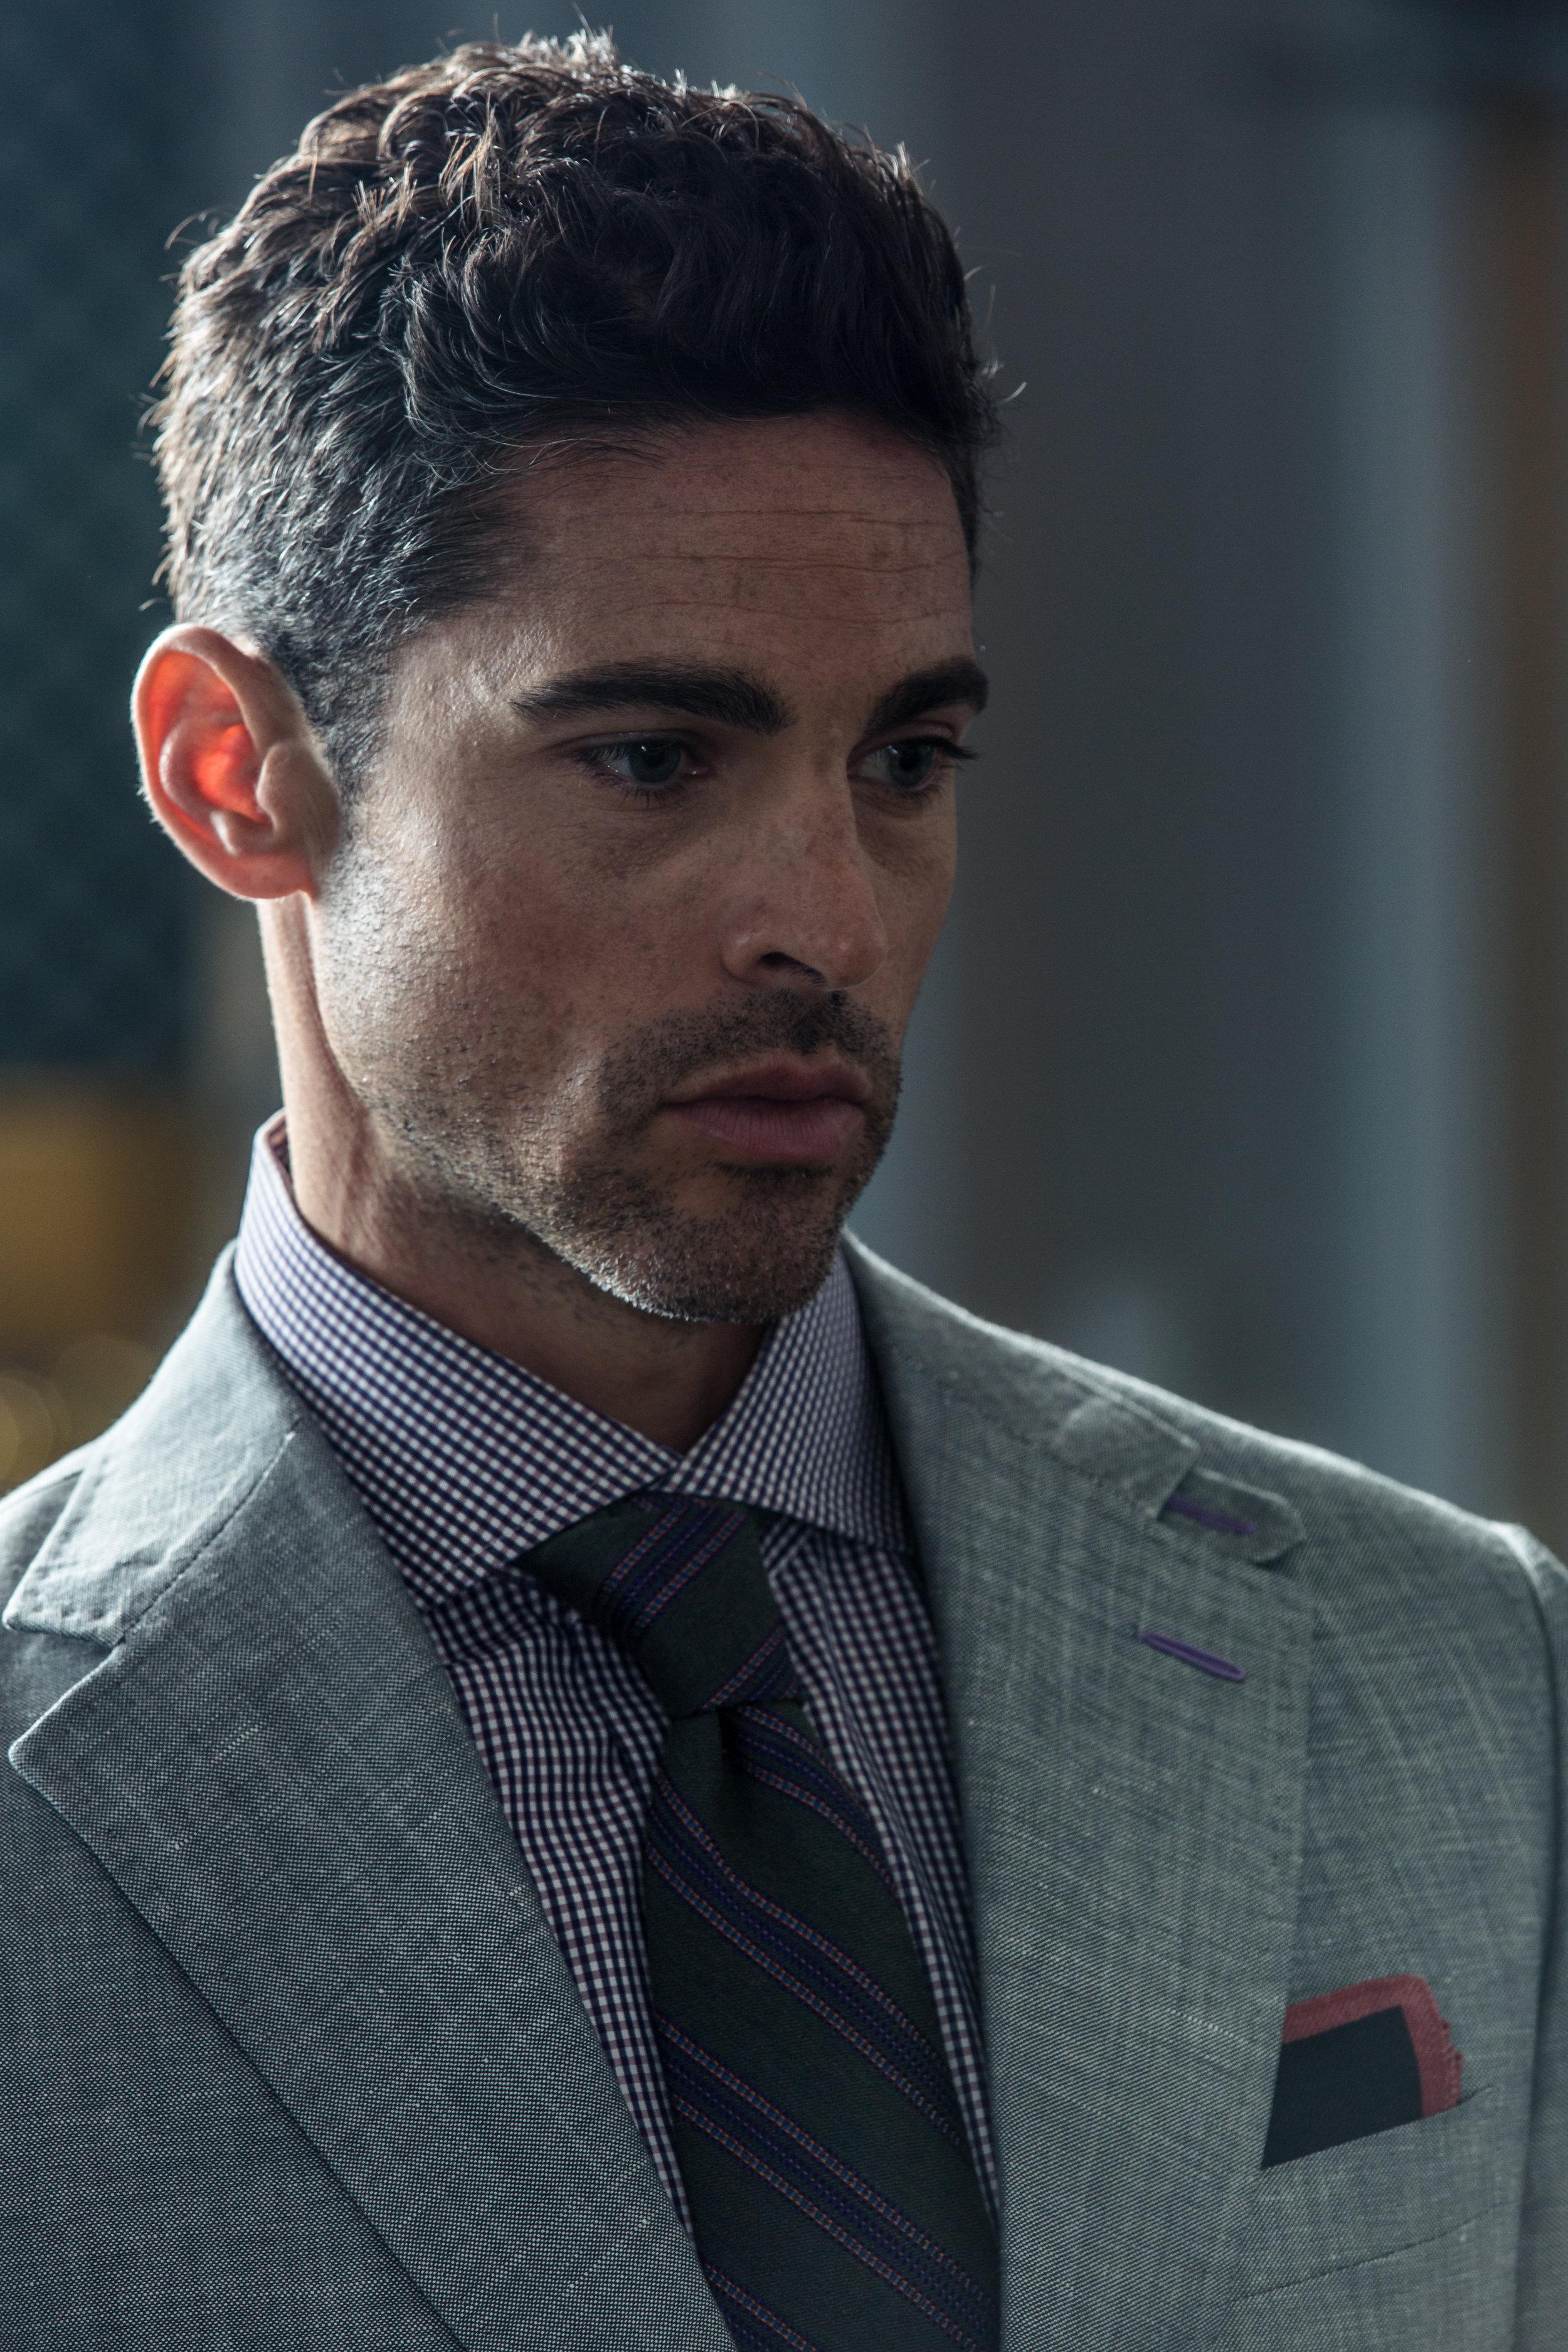 linen bespoke suits